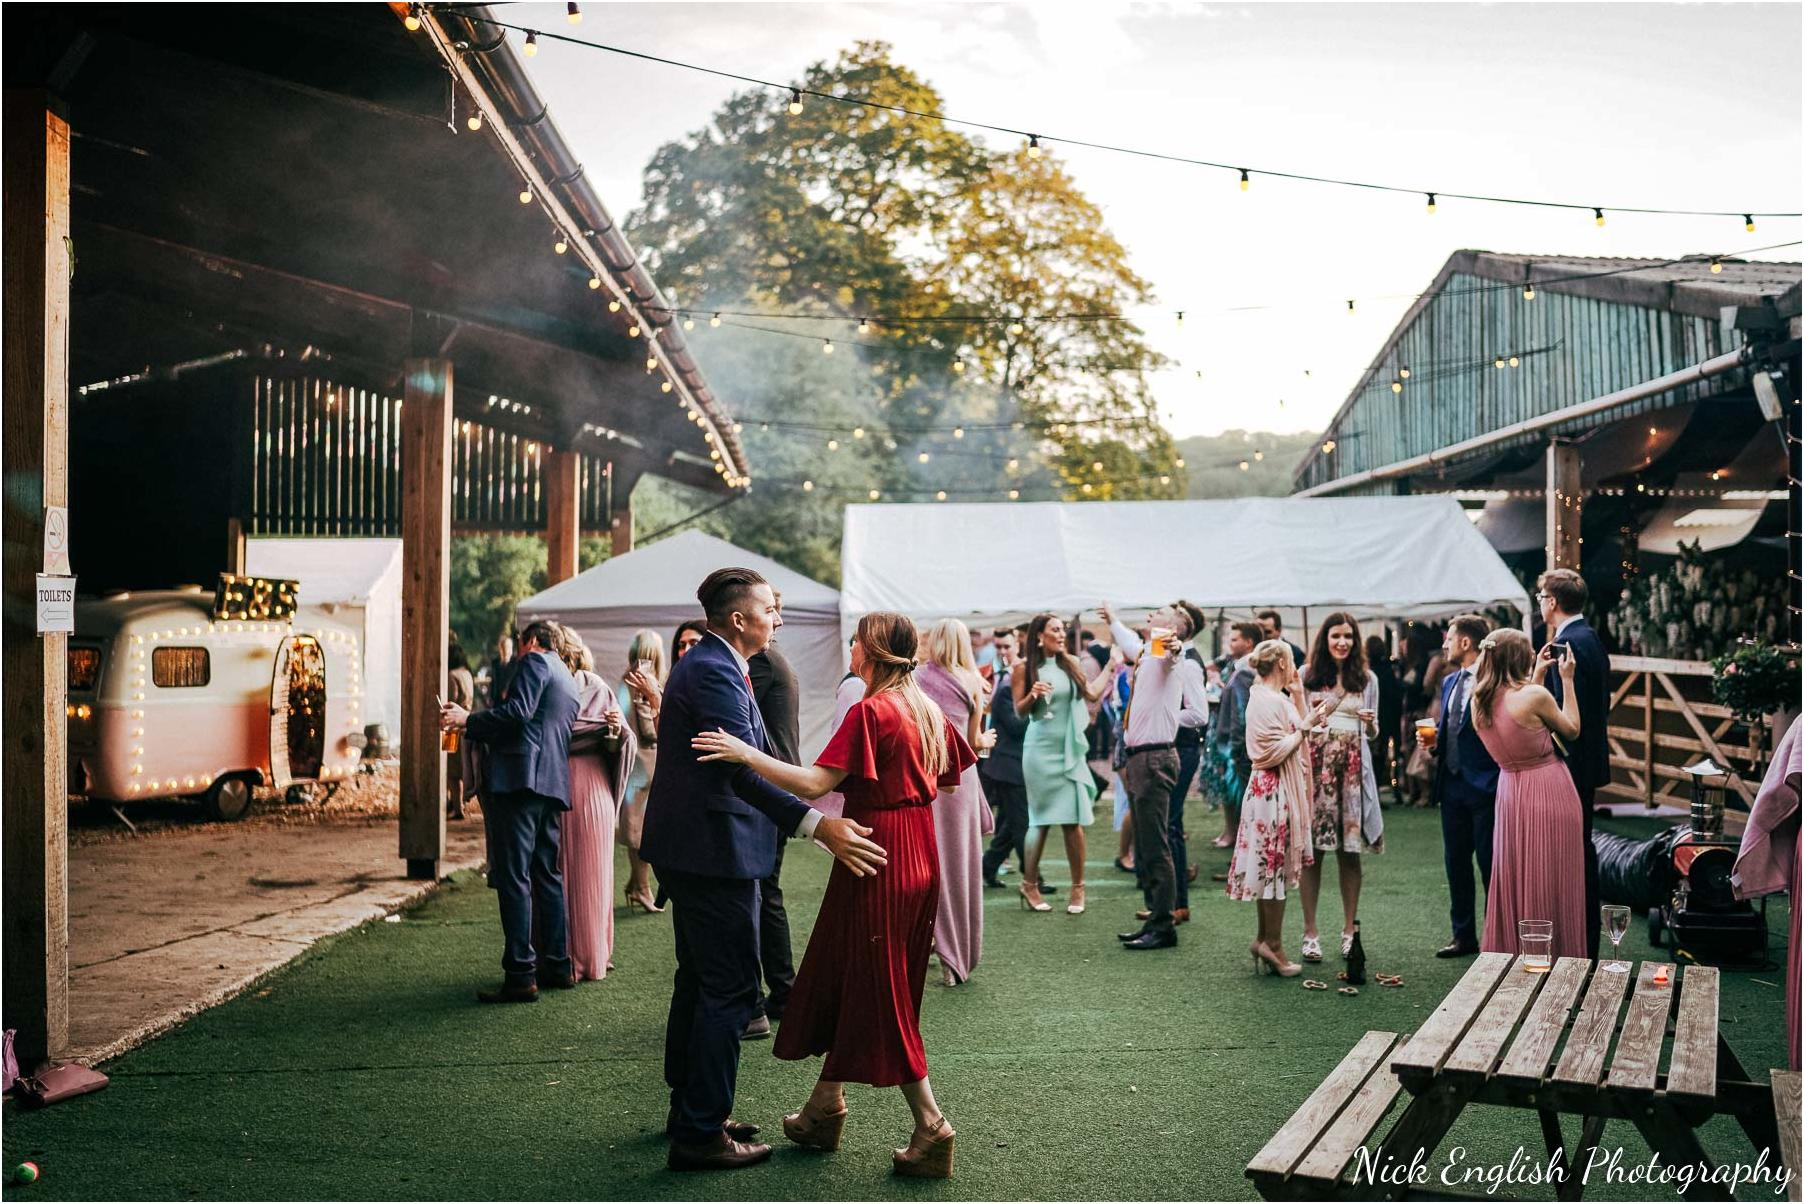 Whitebottom_Farm_Wedding_Manchester_Photograph-114.jpg